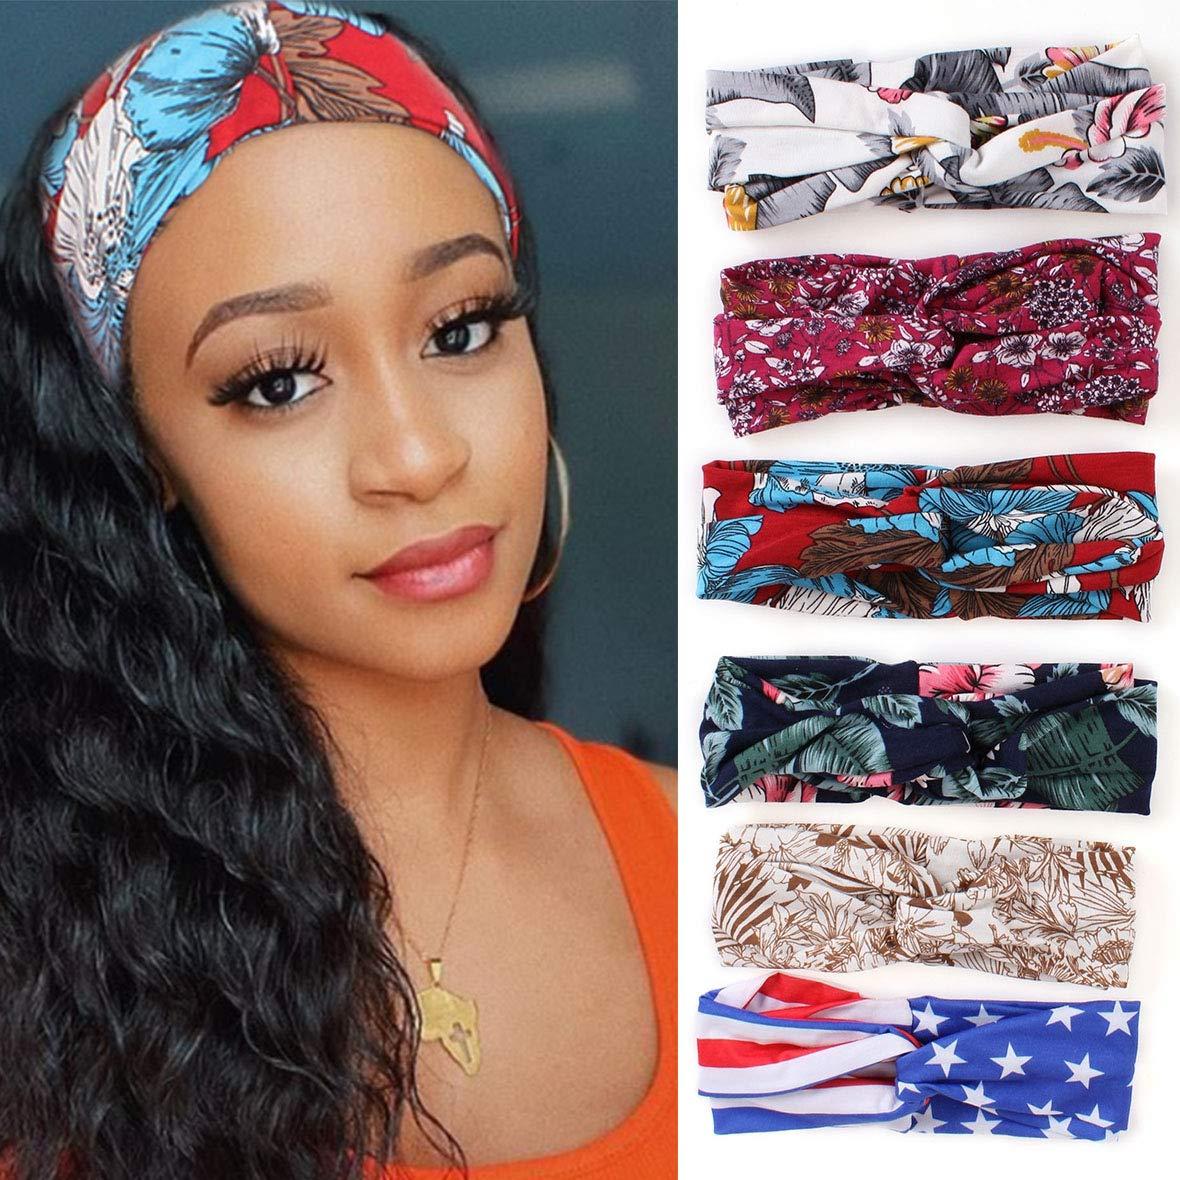 Xtrend 6 Pcs Women's Max 62% OFF Headband Twi Flower Printing New products, world's highest quality popular! Boho Headbands